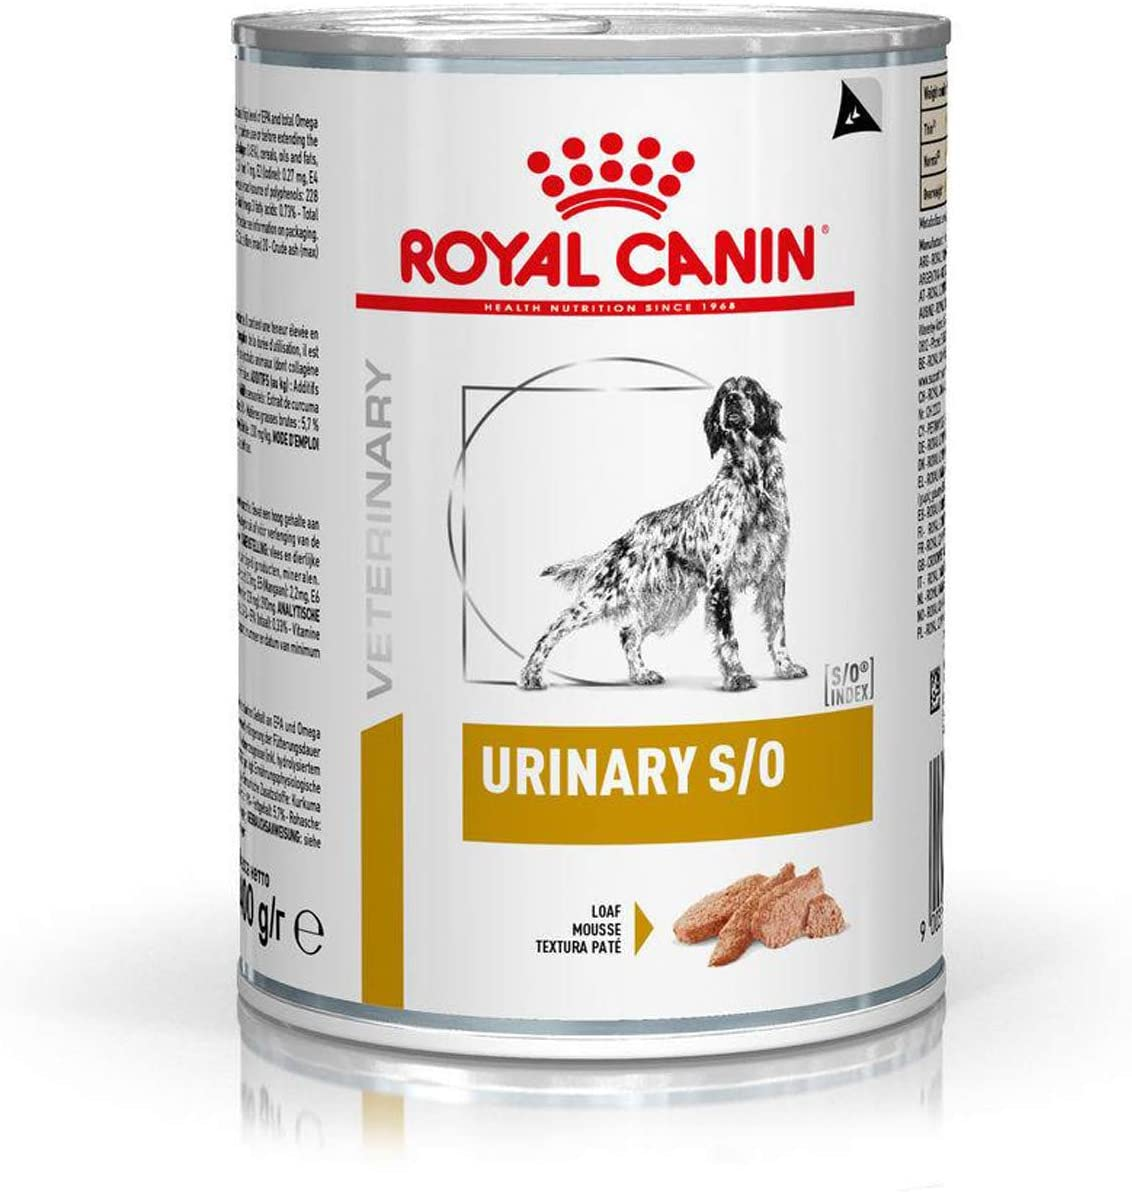 Royal Canin Veterinary diet - Boite Dog Urinary S/0 - 12 x 410g